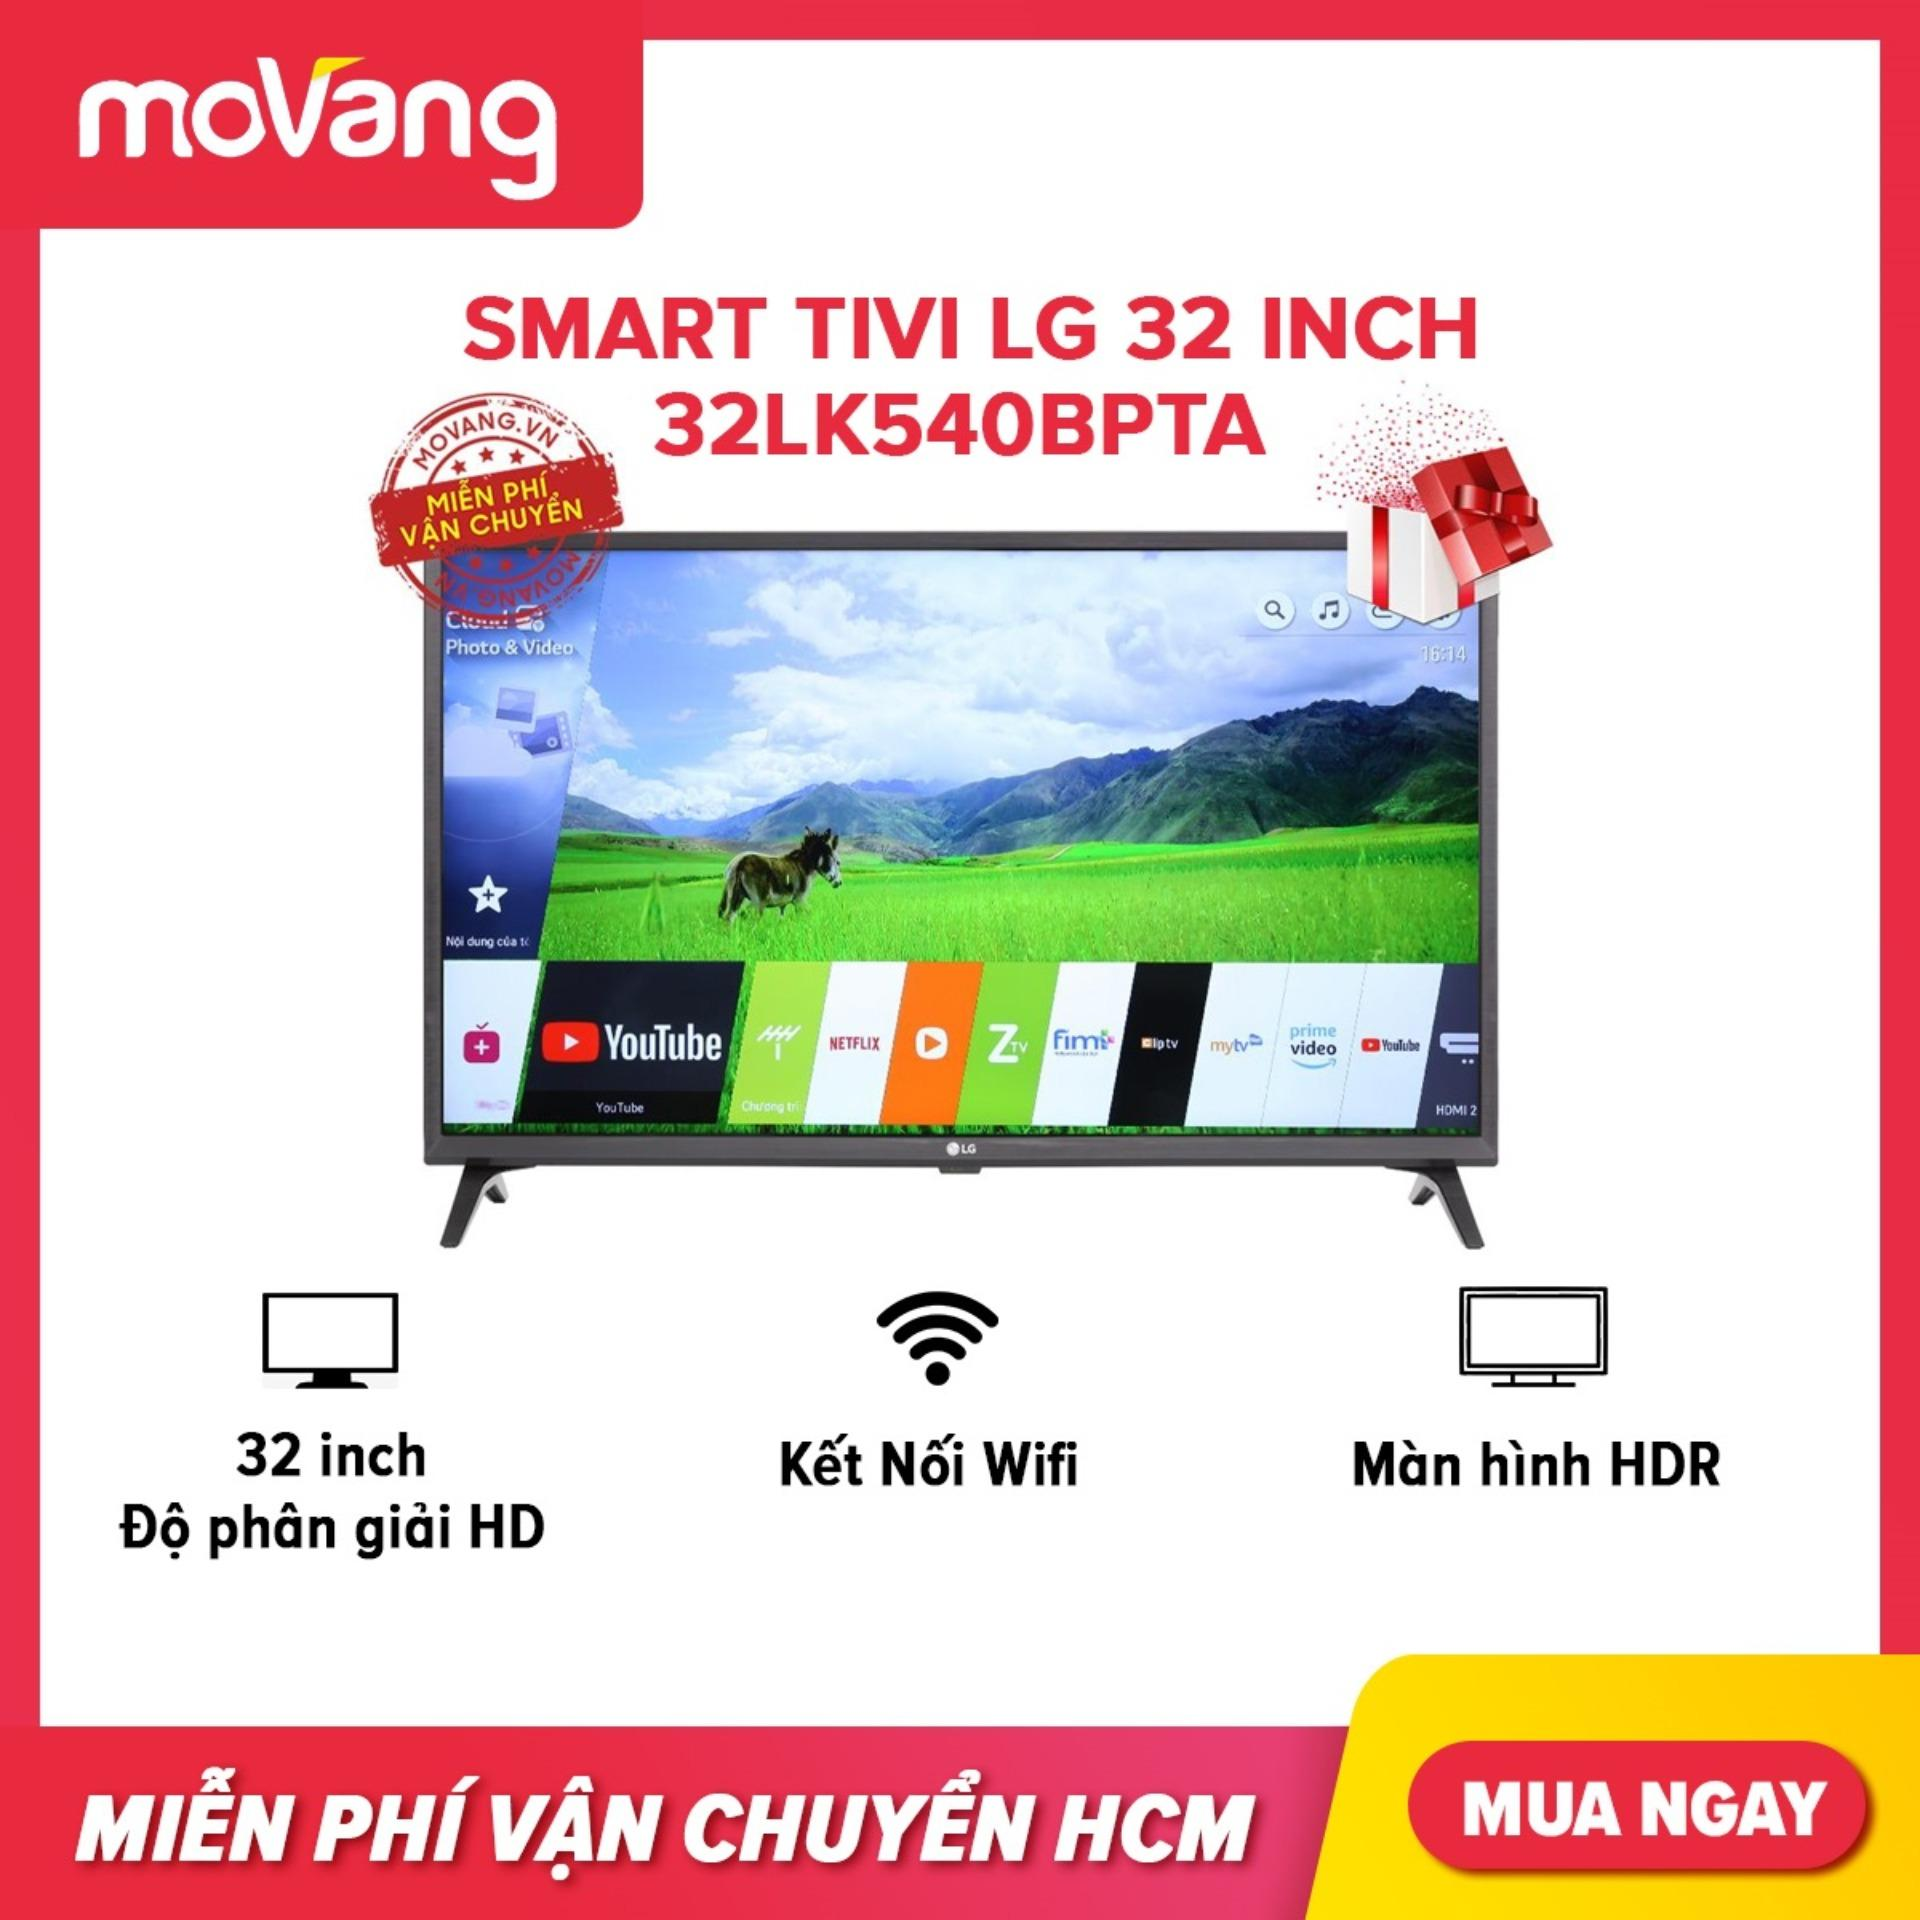 Smart Tivi LG 32 inch 32LK540BPTA